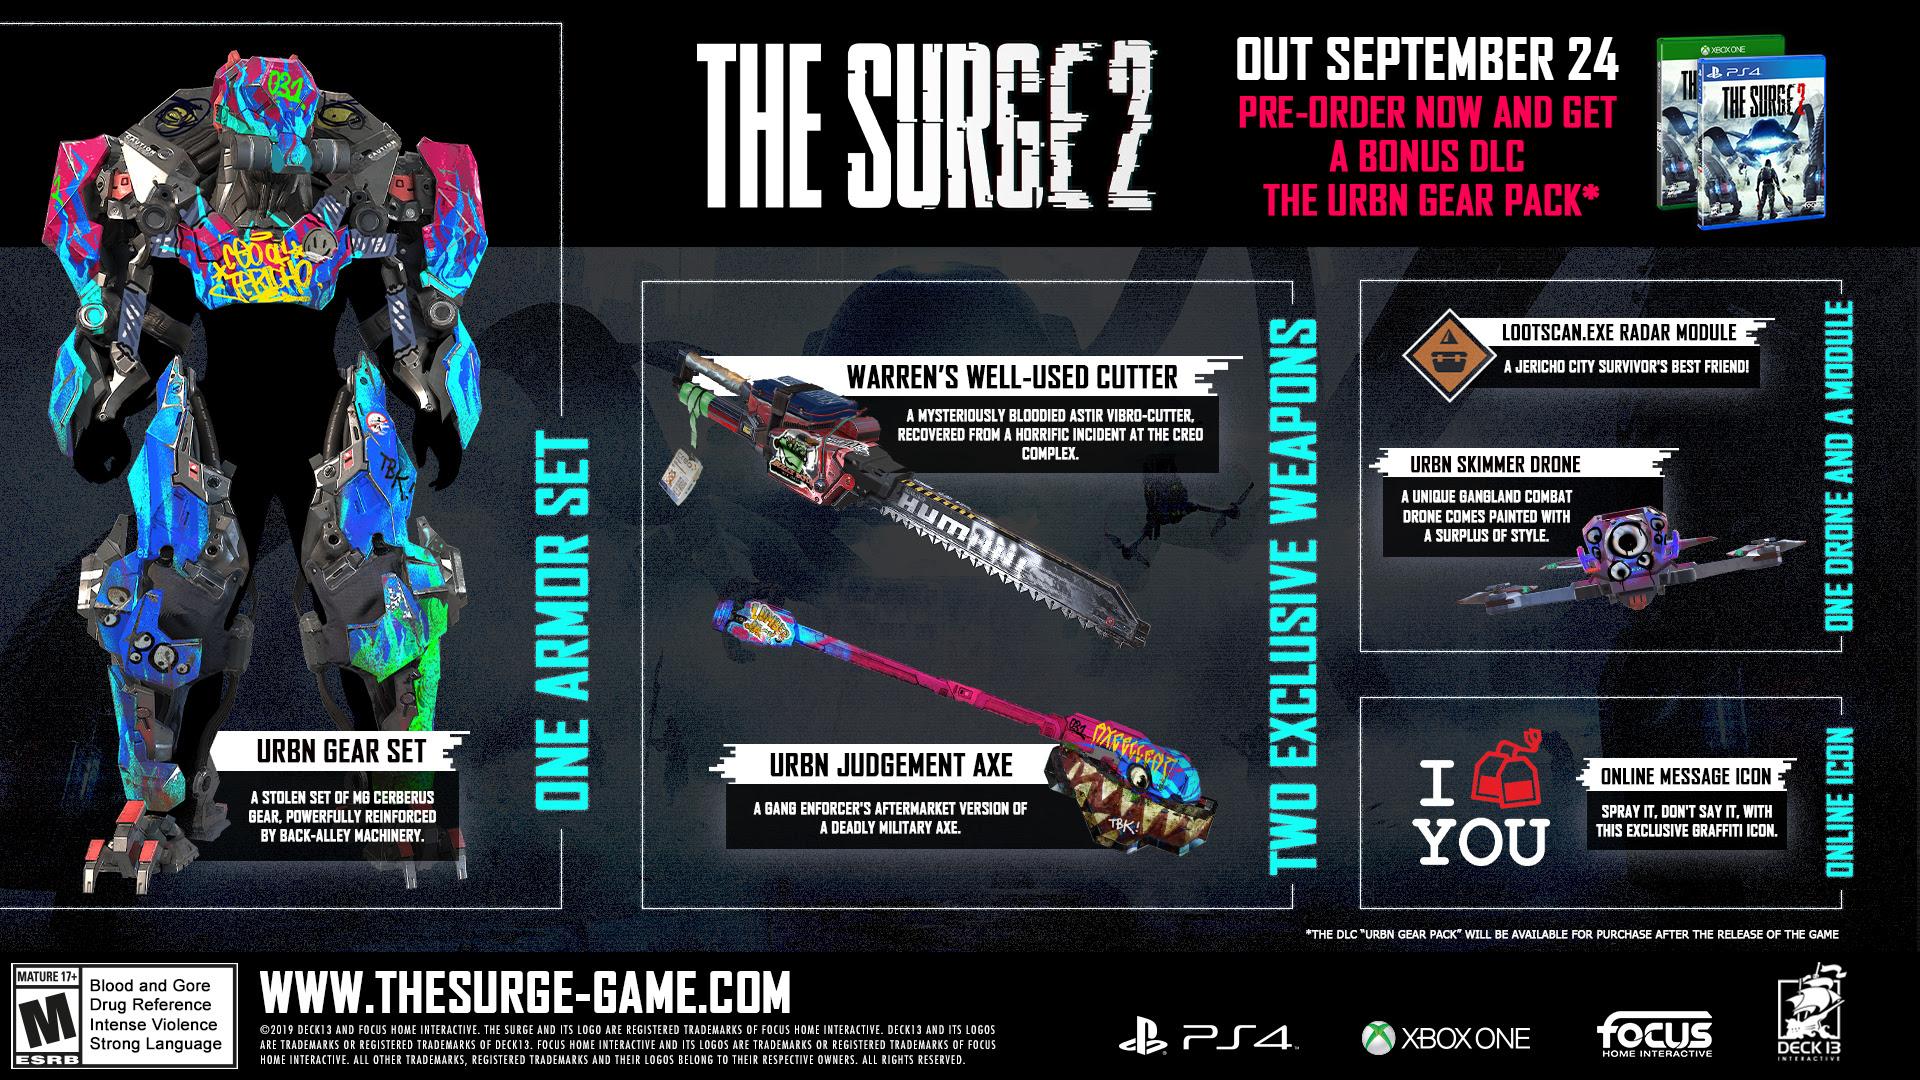 345152_VDwZUwYbU0_the_surge_2_pre_order_